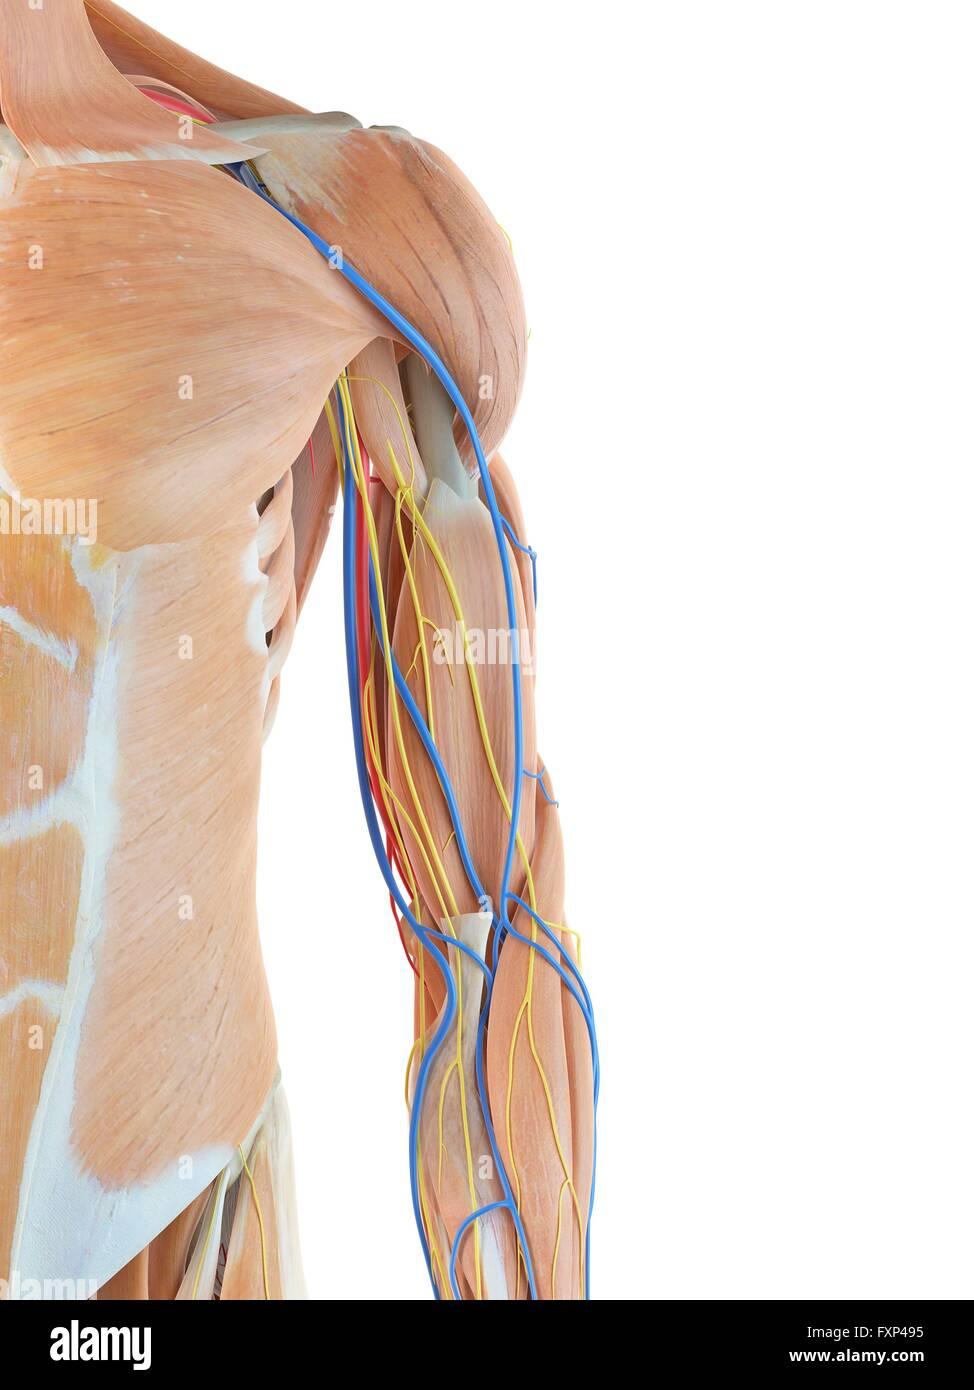 Human Arm Nerves Stock Photos & Human Arm Nerves Stock Images - Alamy